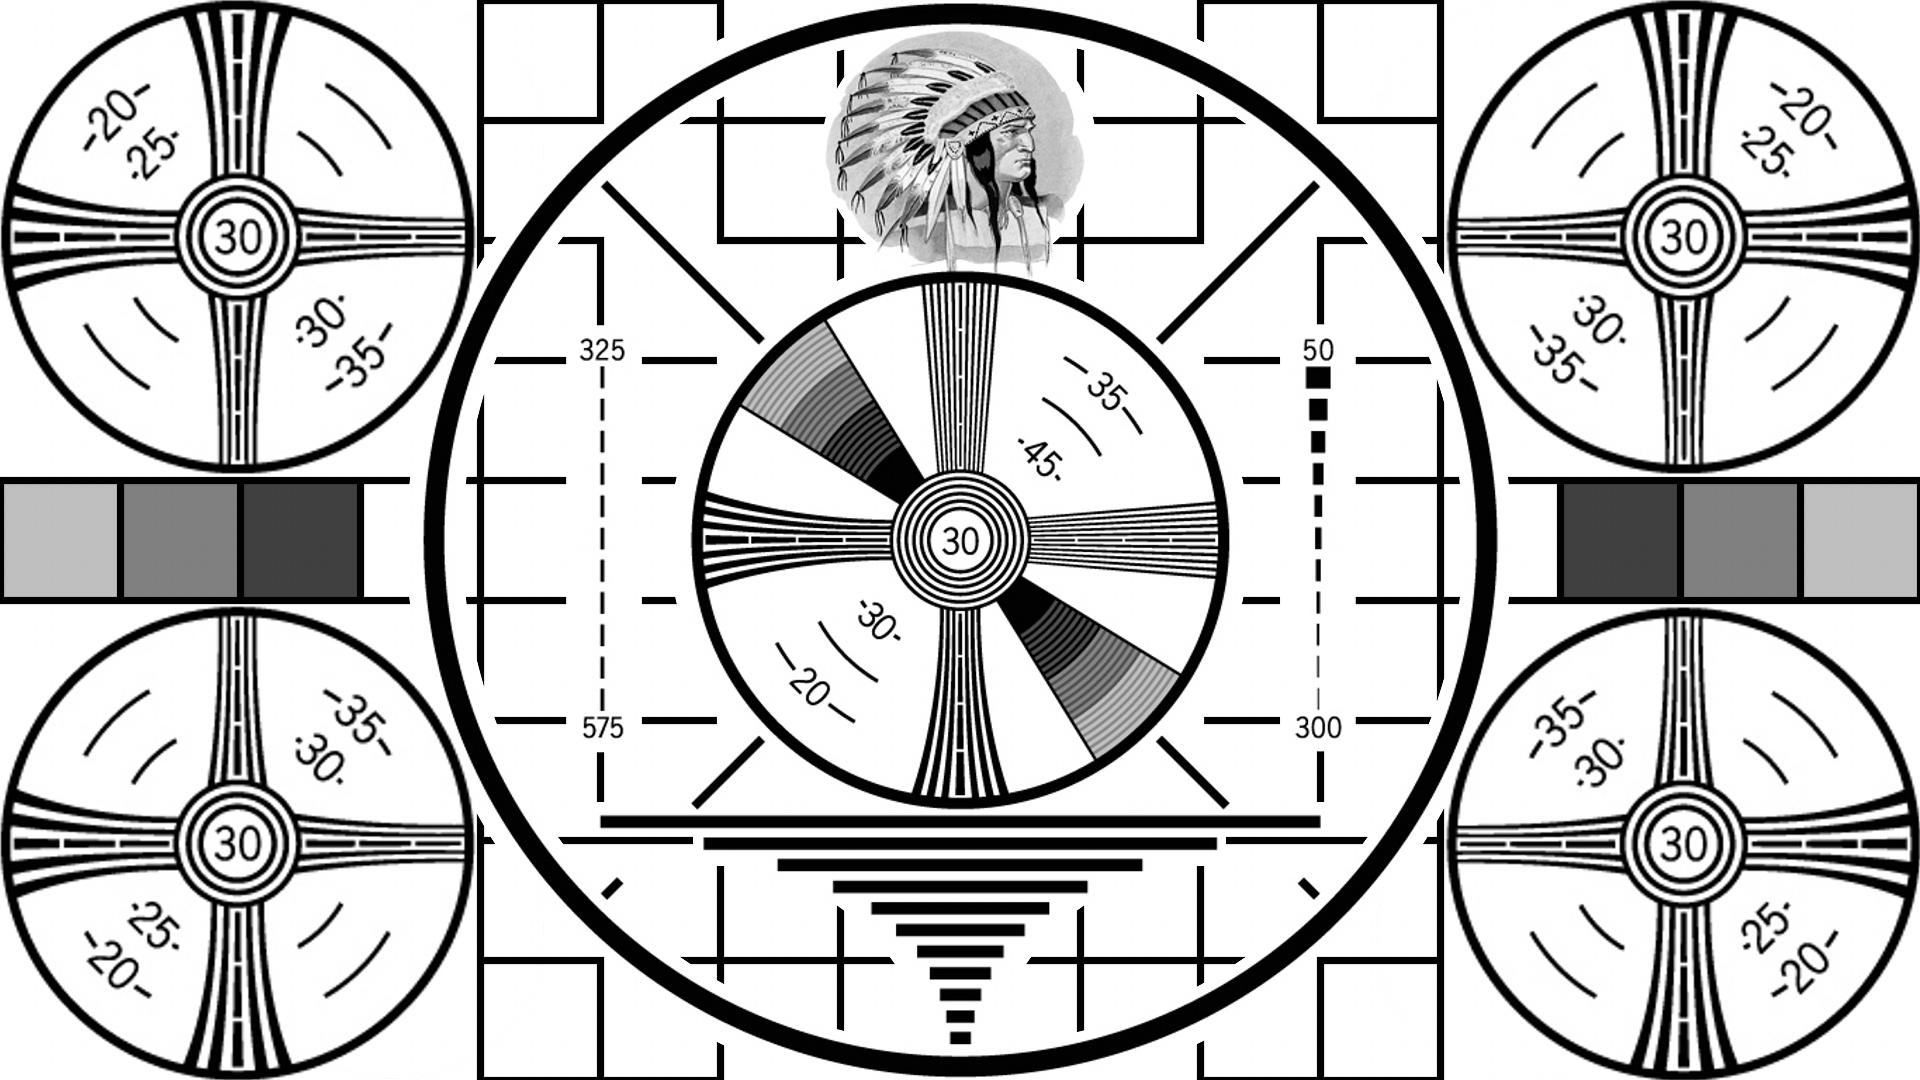 screen pattern saver admincalendar aperturestudios showing 1920x1080